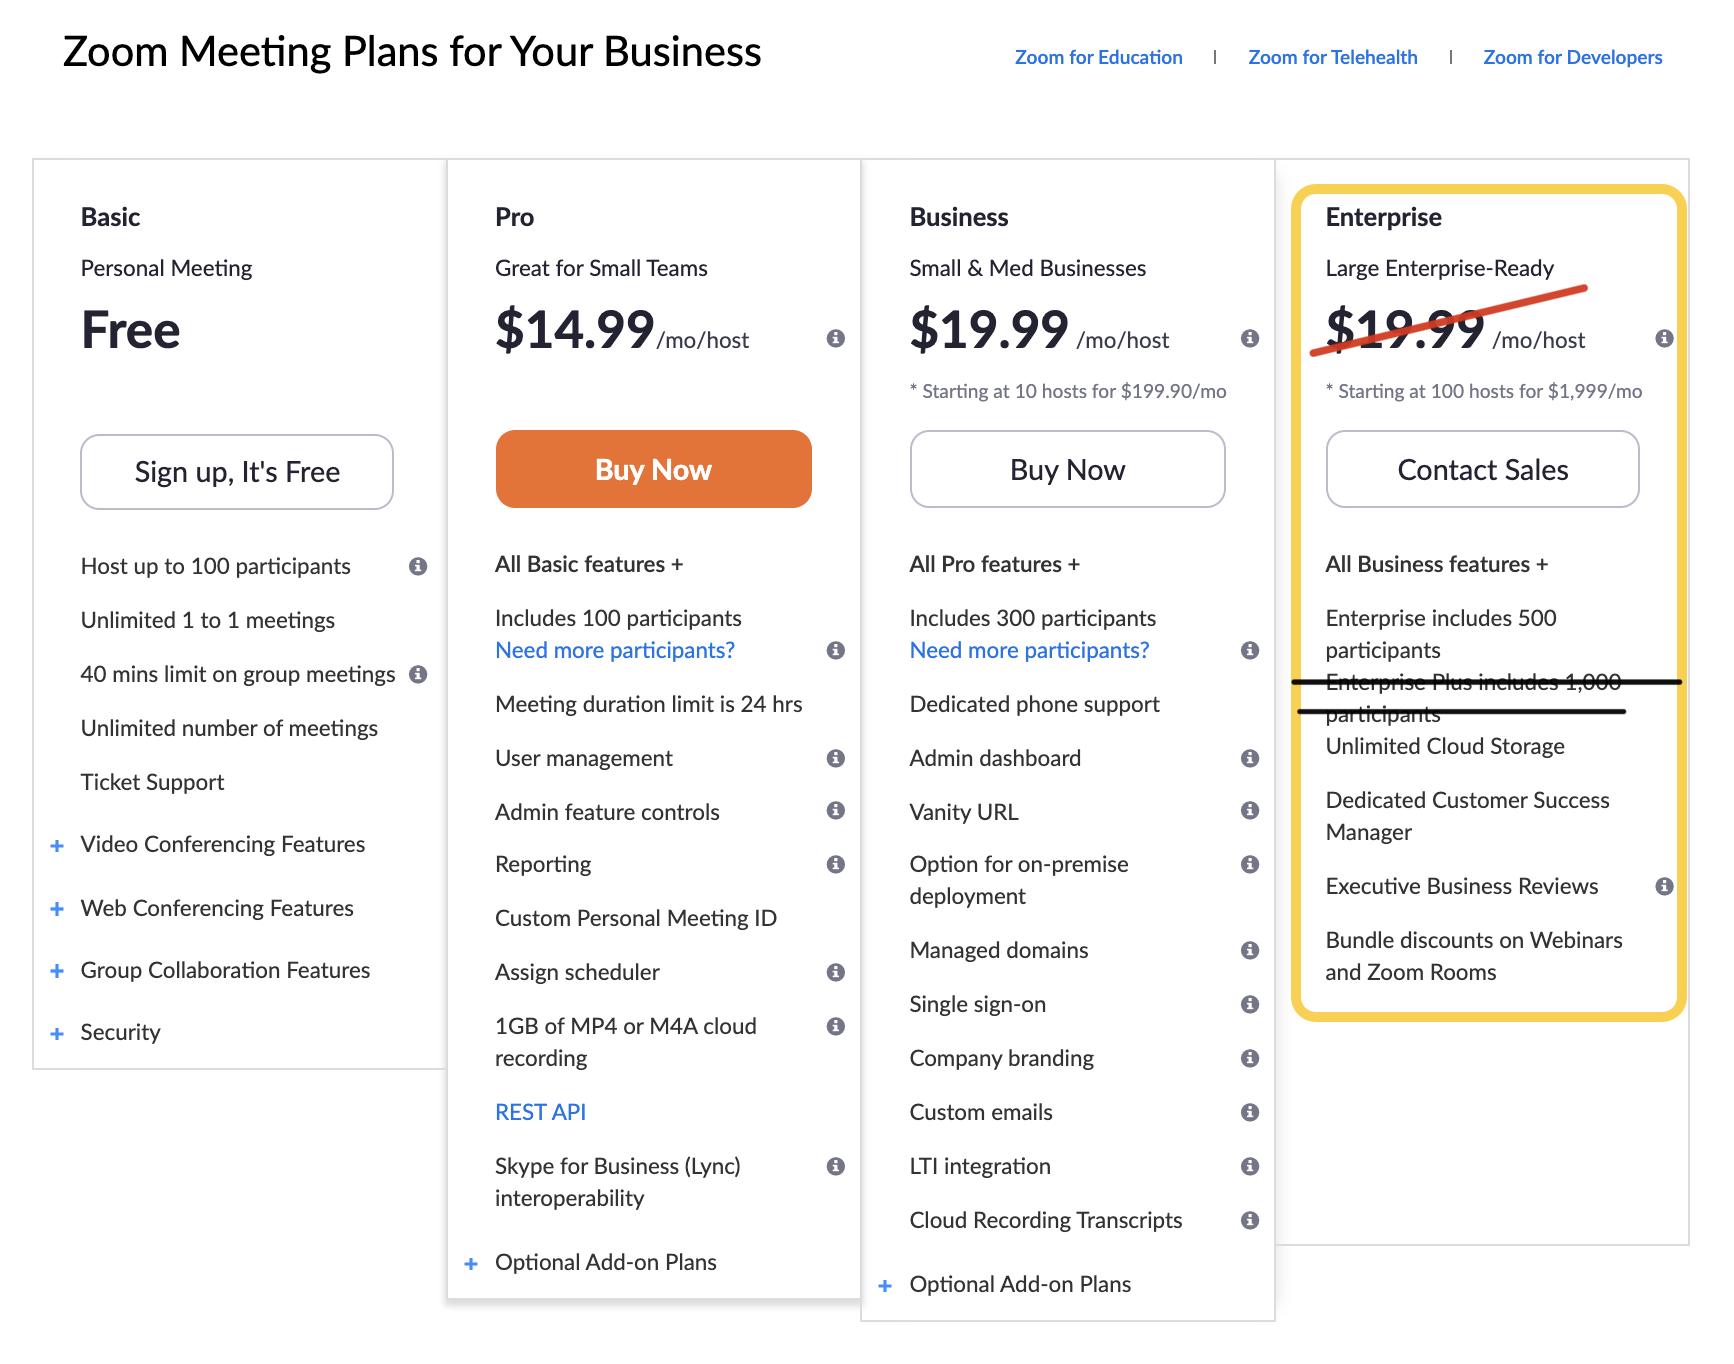 UMCom's Zoom Pricing Plan